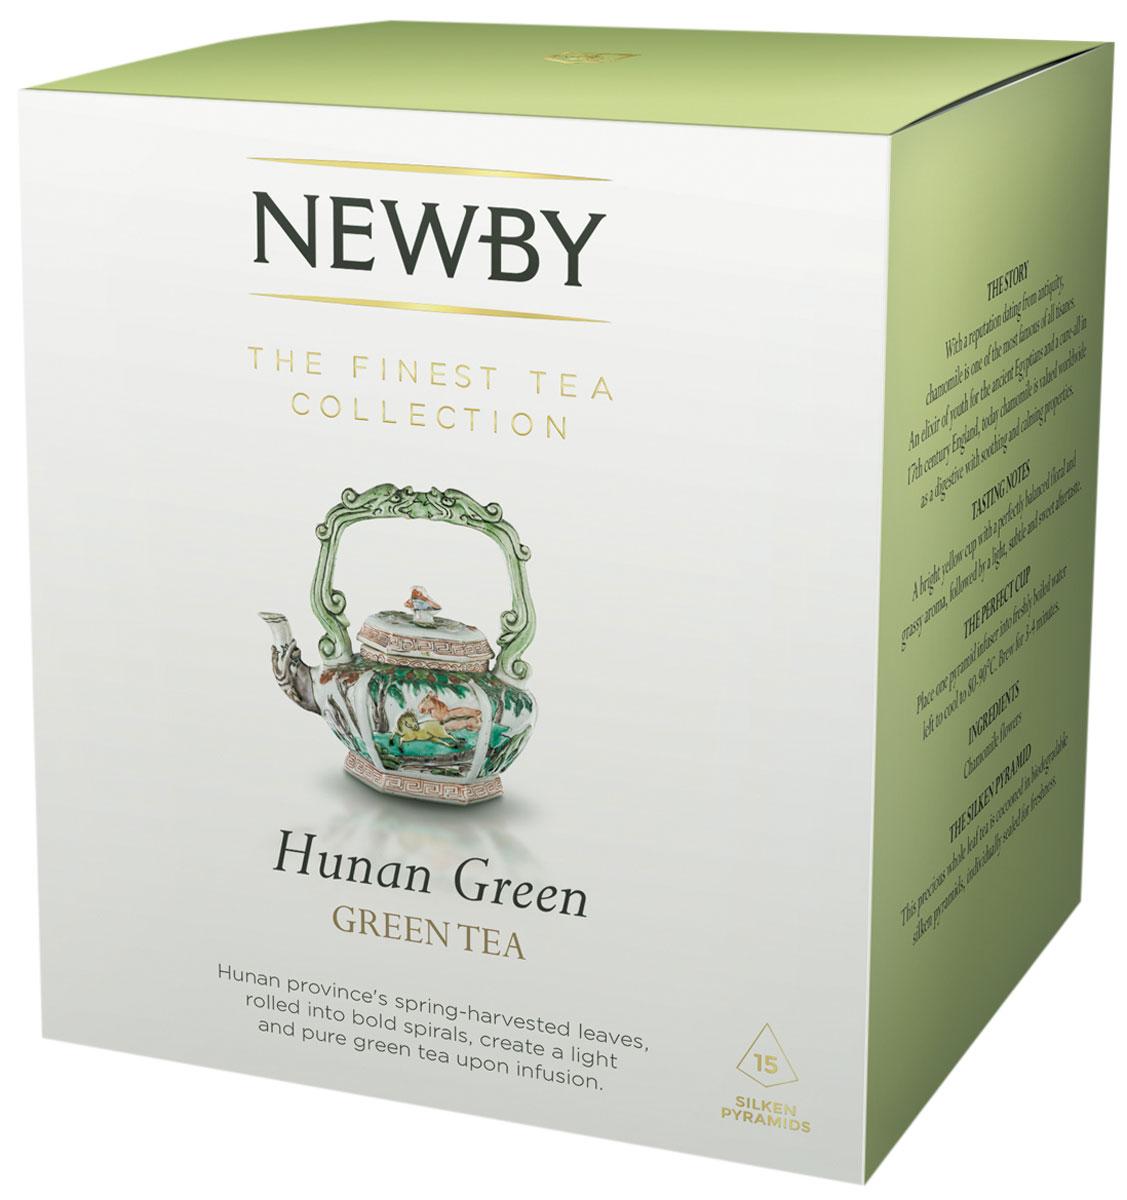 Newby Hunan Green зеленый чай в пирамидках, 15 шт newby masala chai черный листовой чай со специями в пирамидках 15 шт